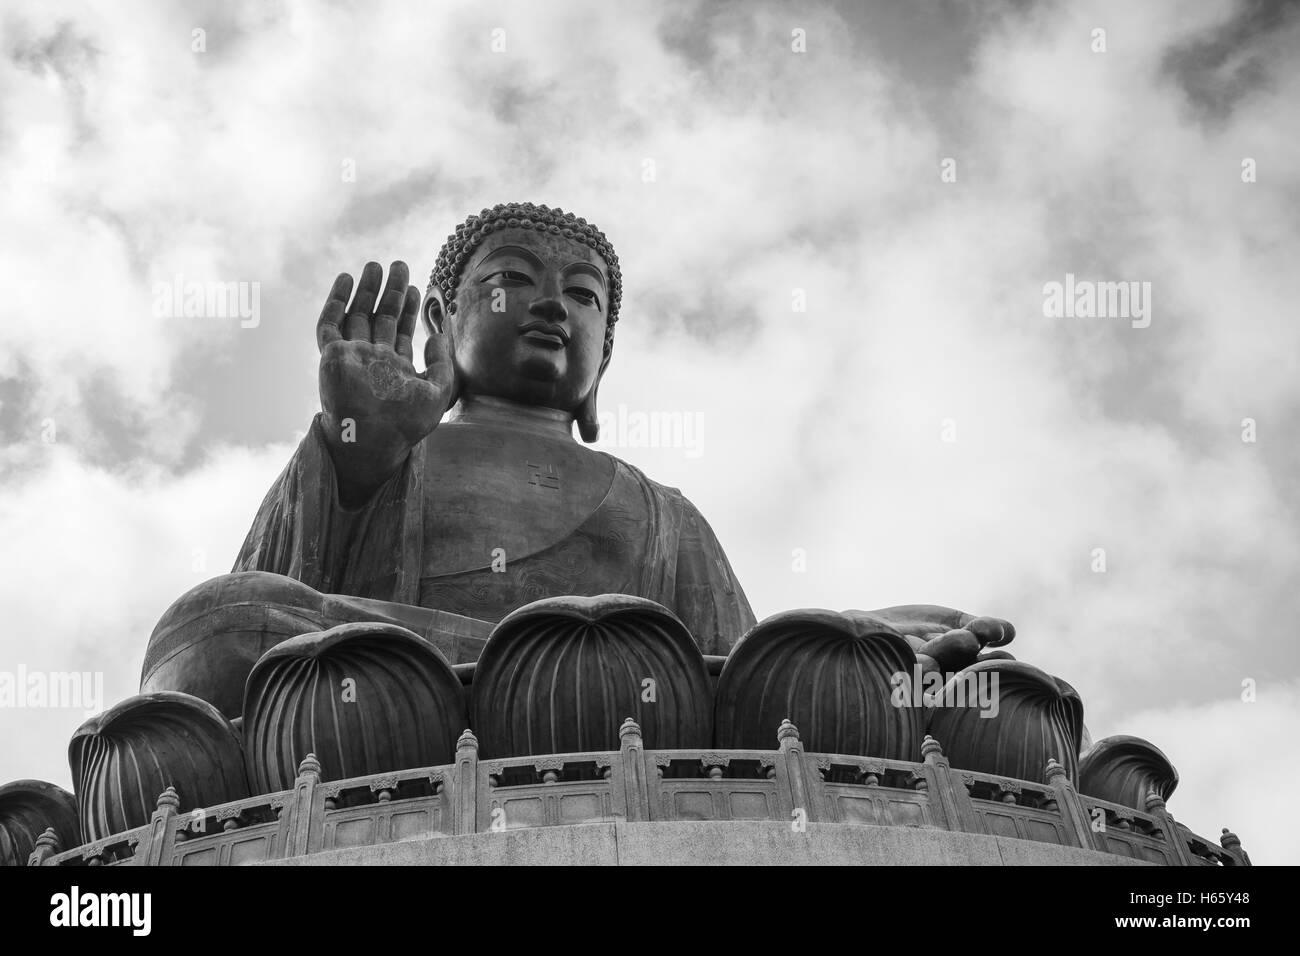 Tian Tan Buddha (Big Buddha) statue in black&white at Ngong Ping on Lantau Island in Hong Kong, China, viewed - Stock Image